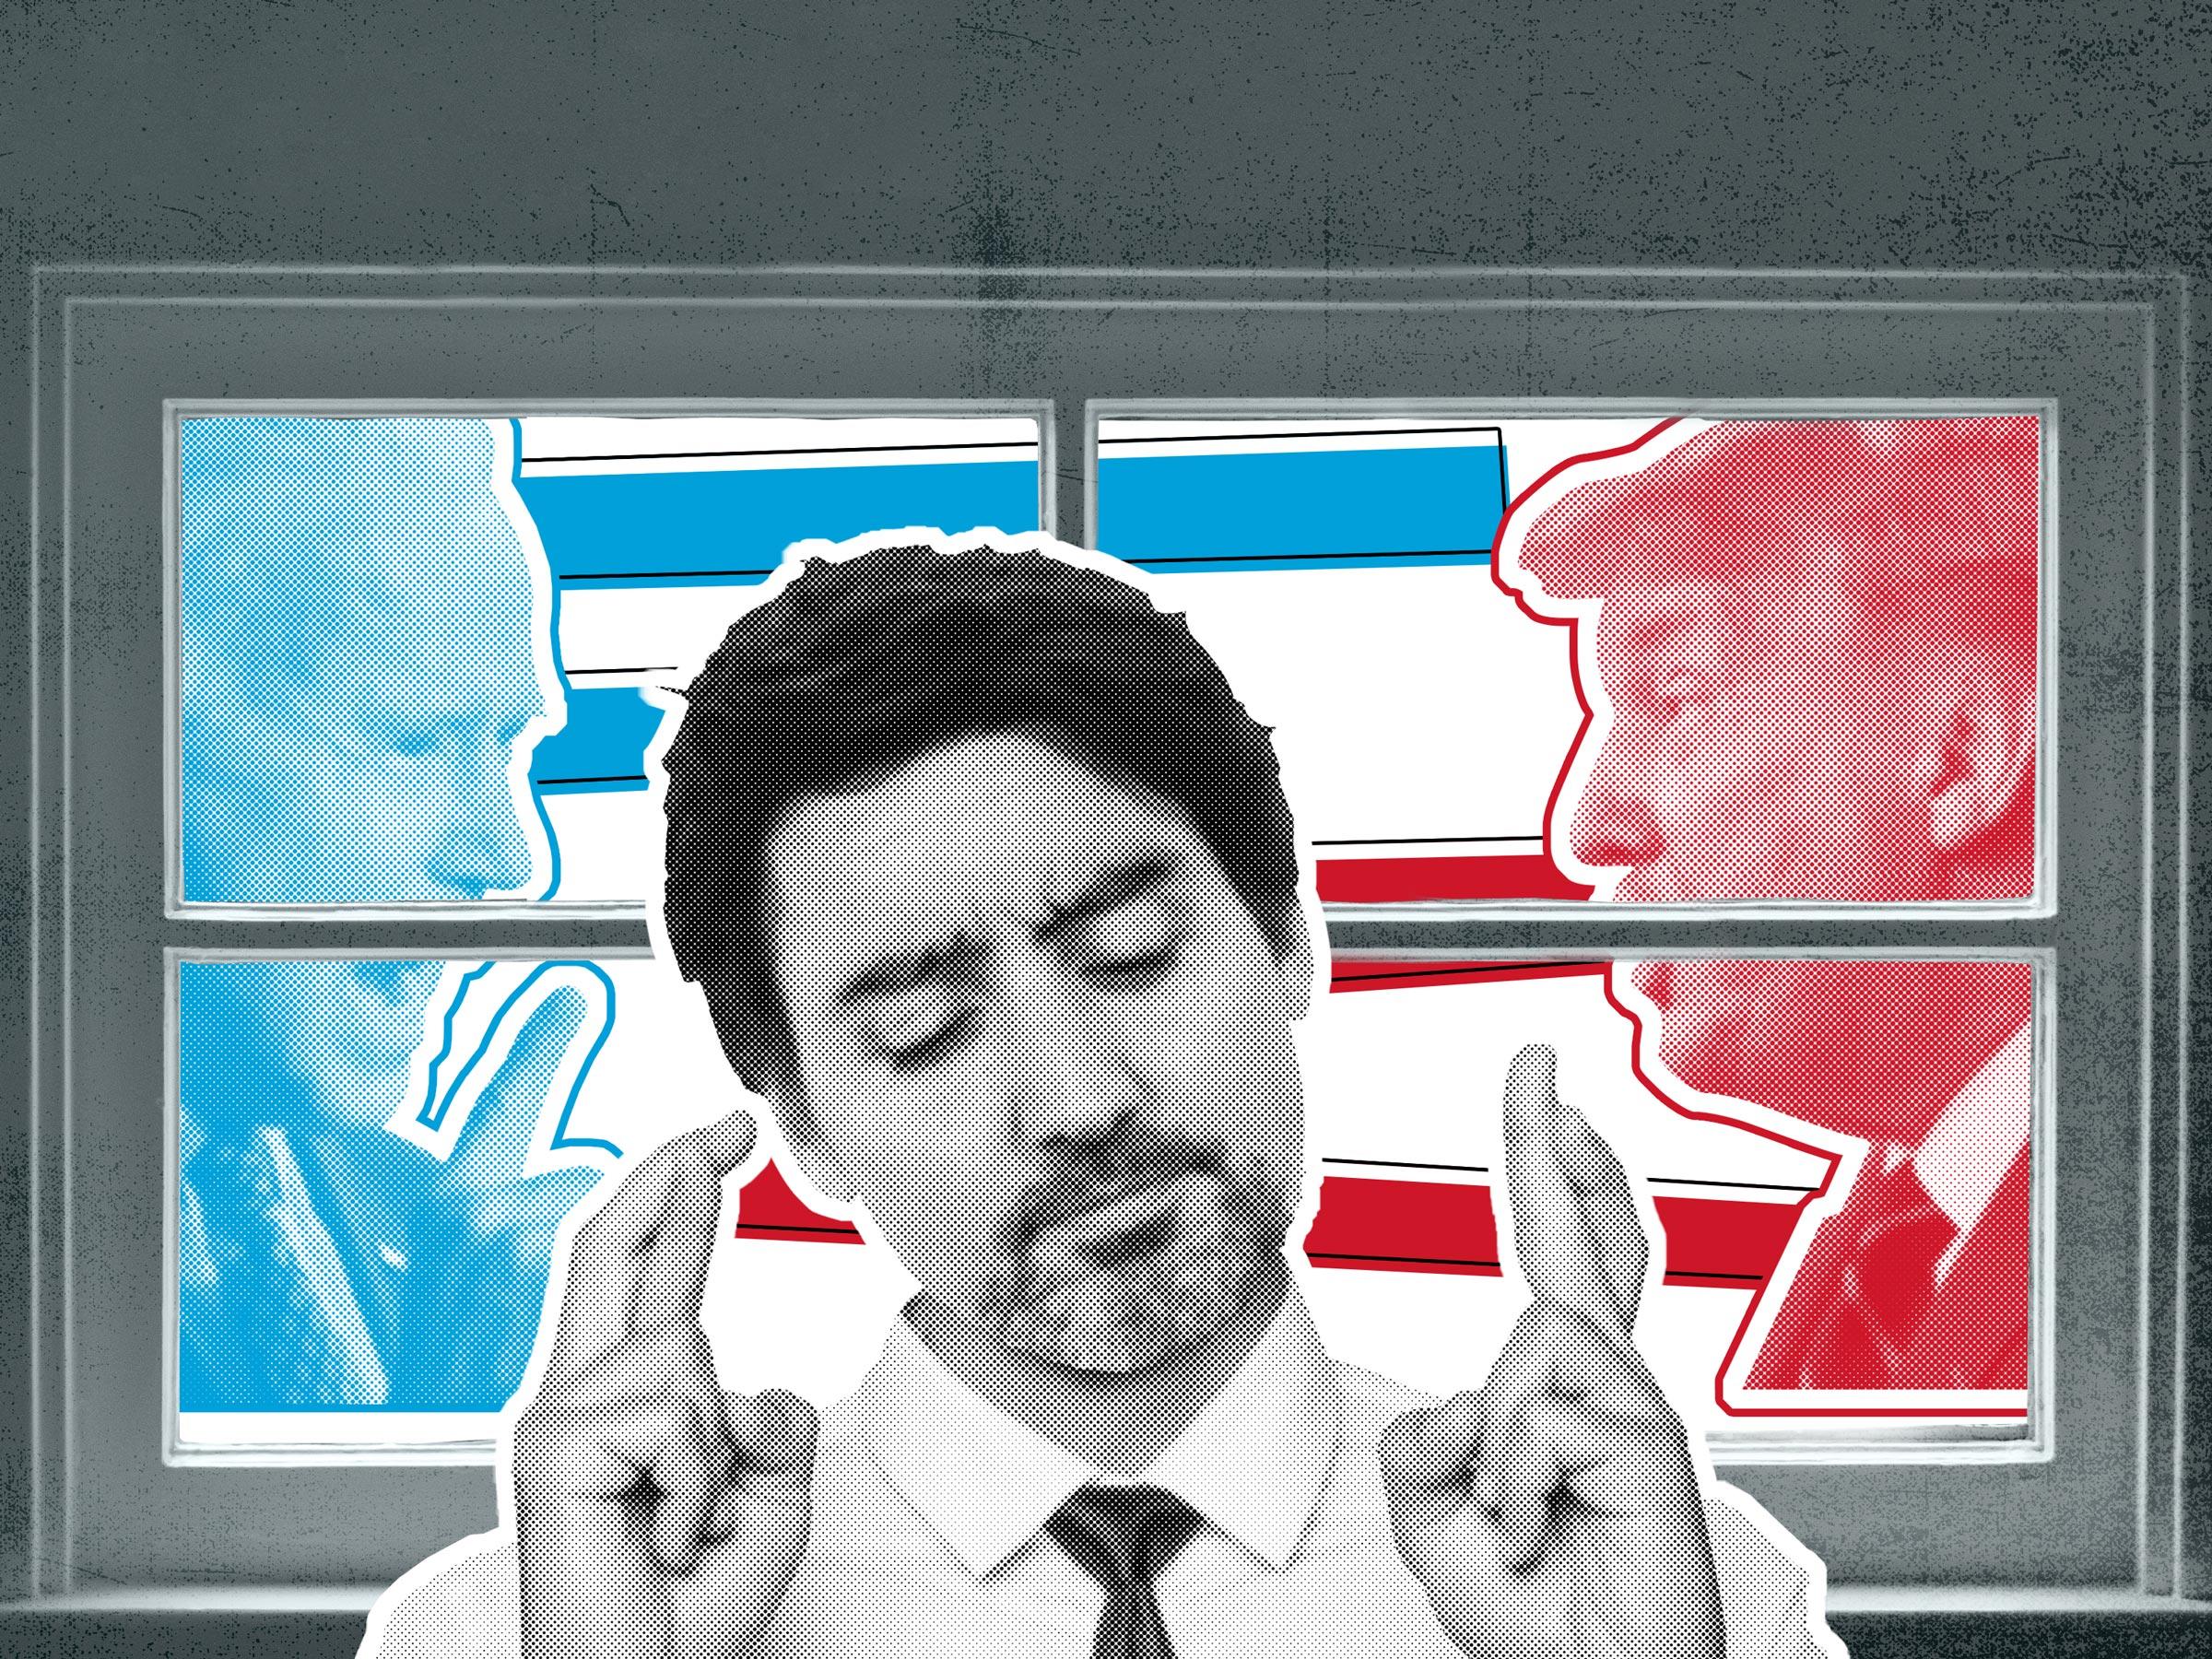 election collage - Trump, Bidden and Trudea